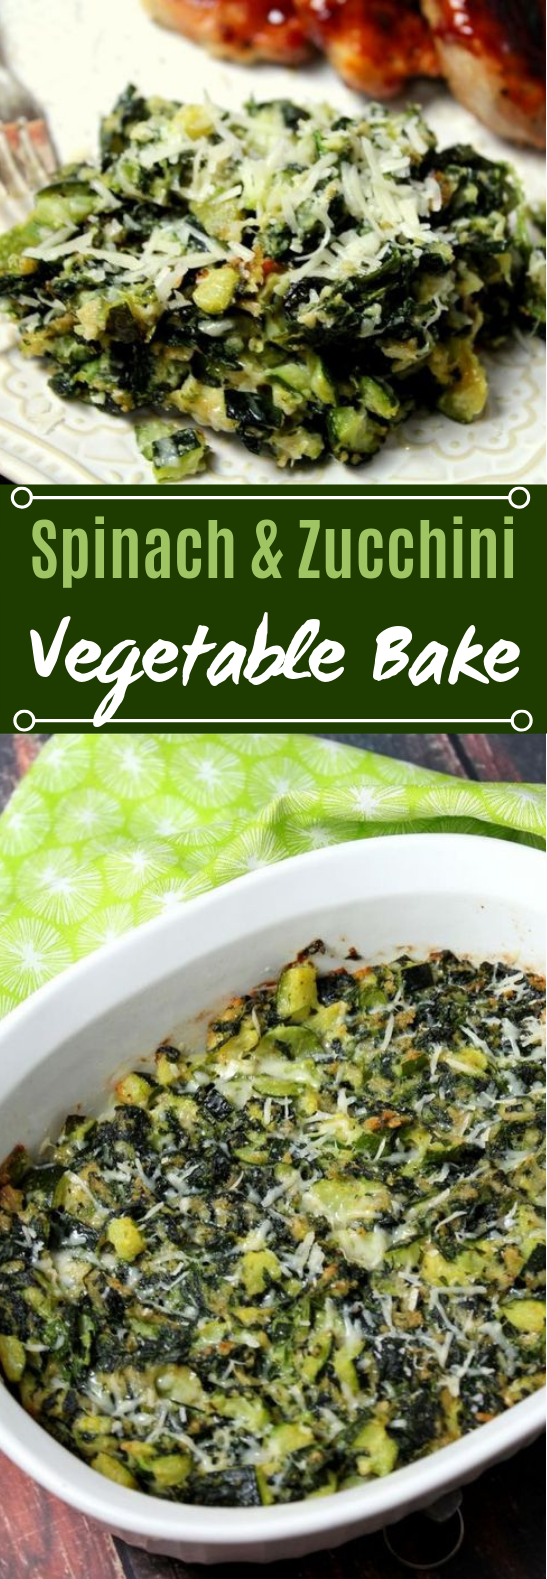 Spinach and Zucchini Vegetable Bake #vegetarian #veggies